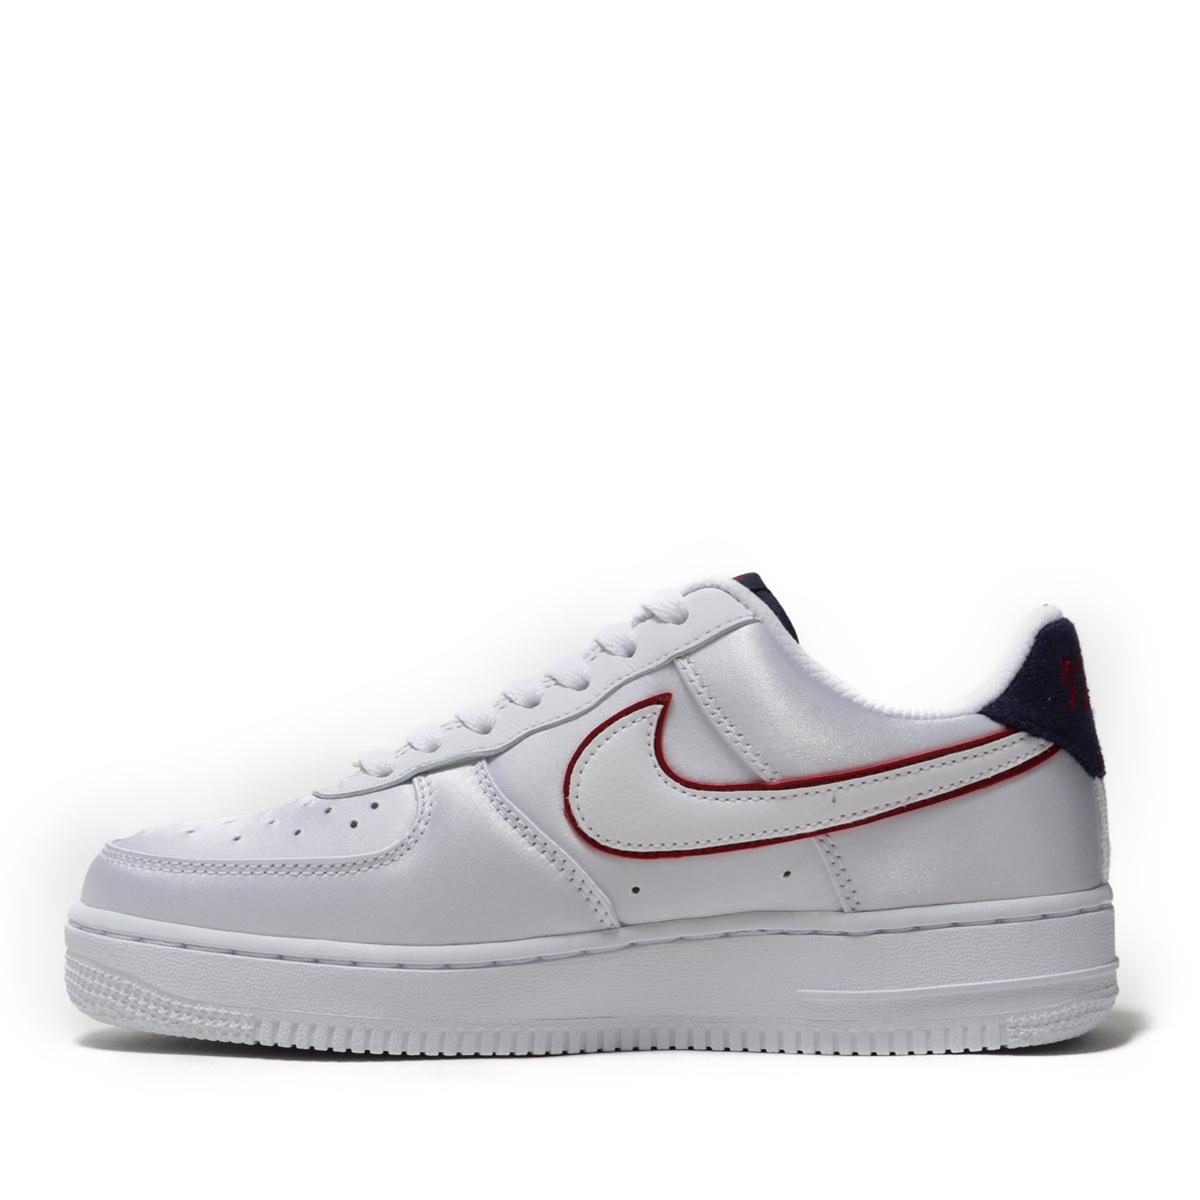 NIKE WMNS AIR FORCE 1  07 SE (Nike women air force 1 07 SE)  WHITE WHITE-BLACKENED BLUE 18FA-I 87fa803f6